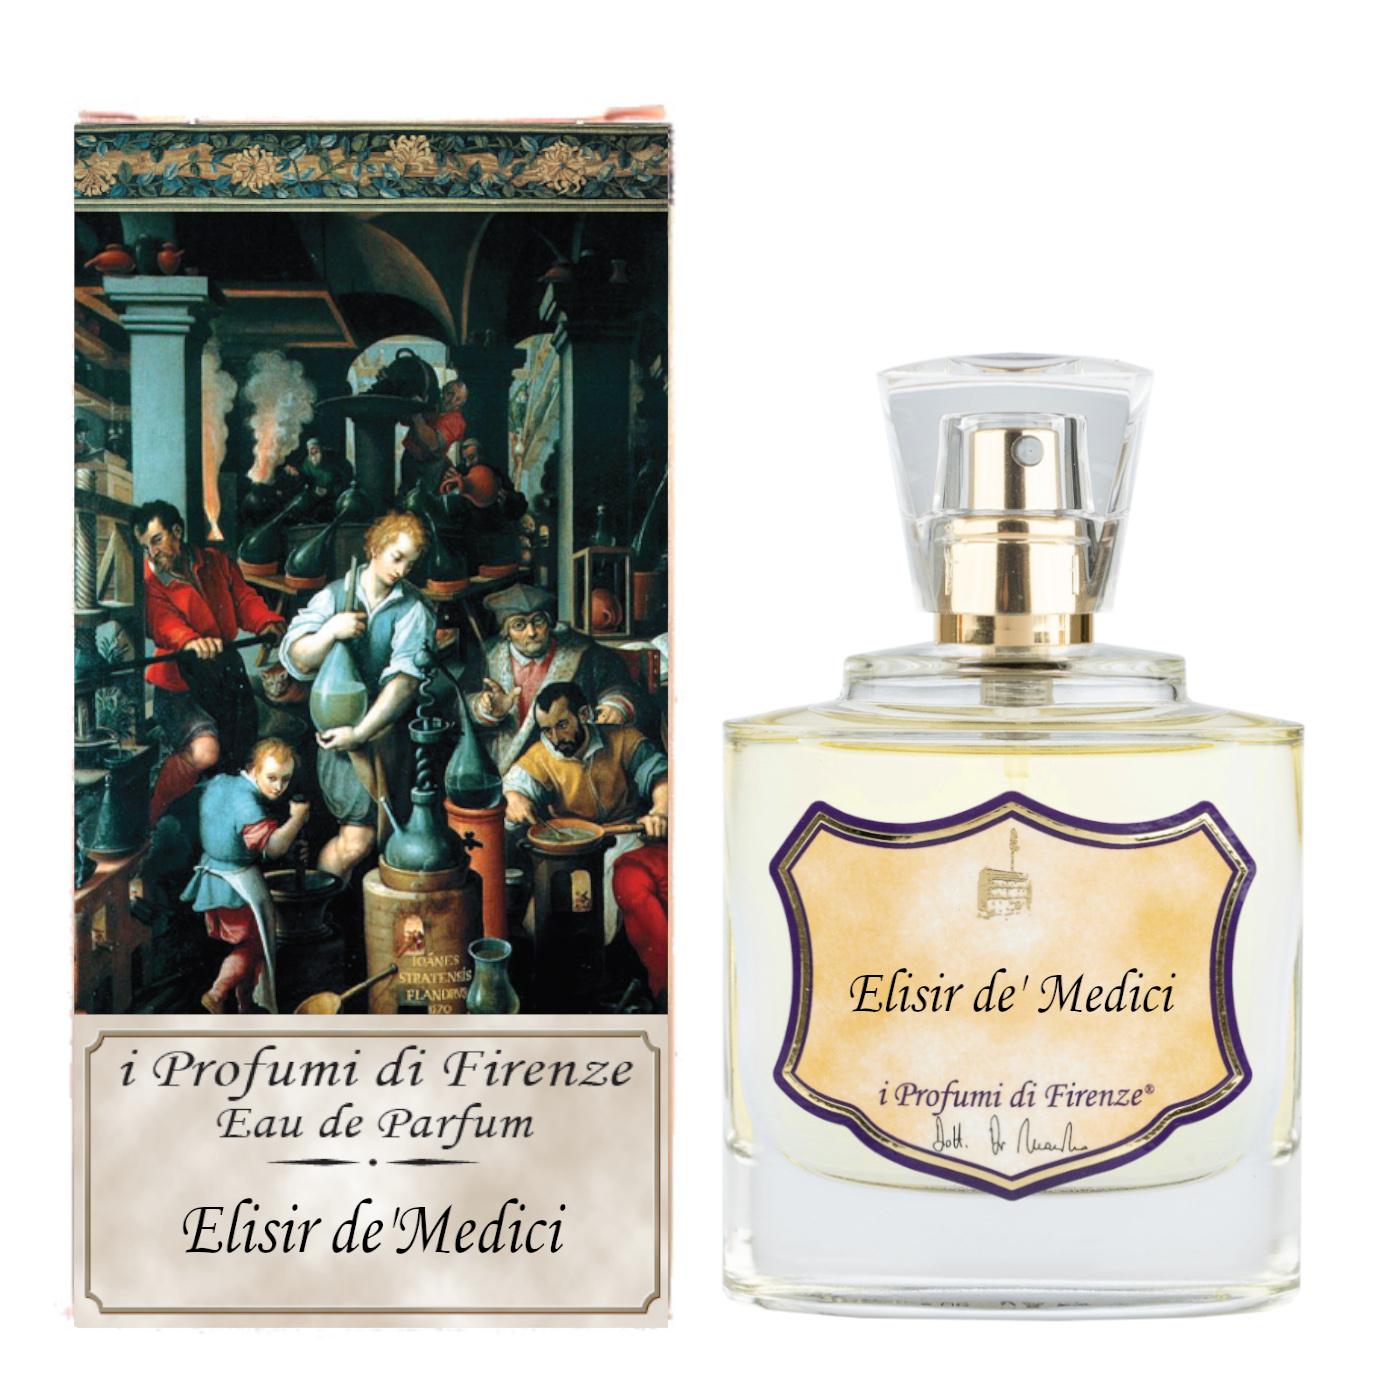 ELISIR DE' MEDICI - Eau de Parfum-4133